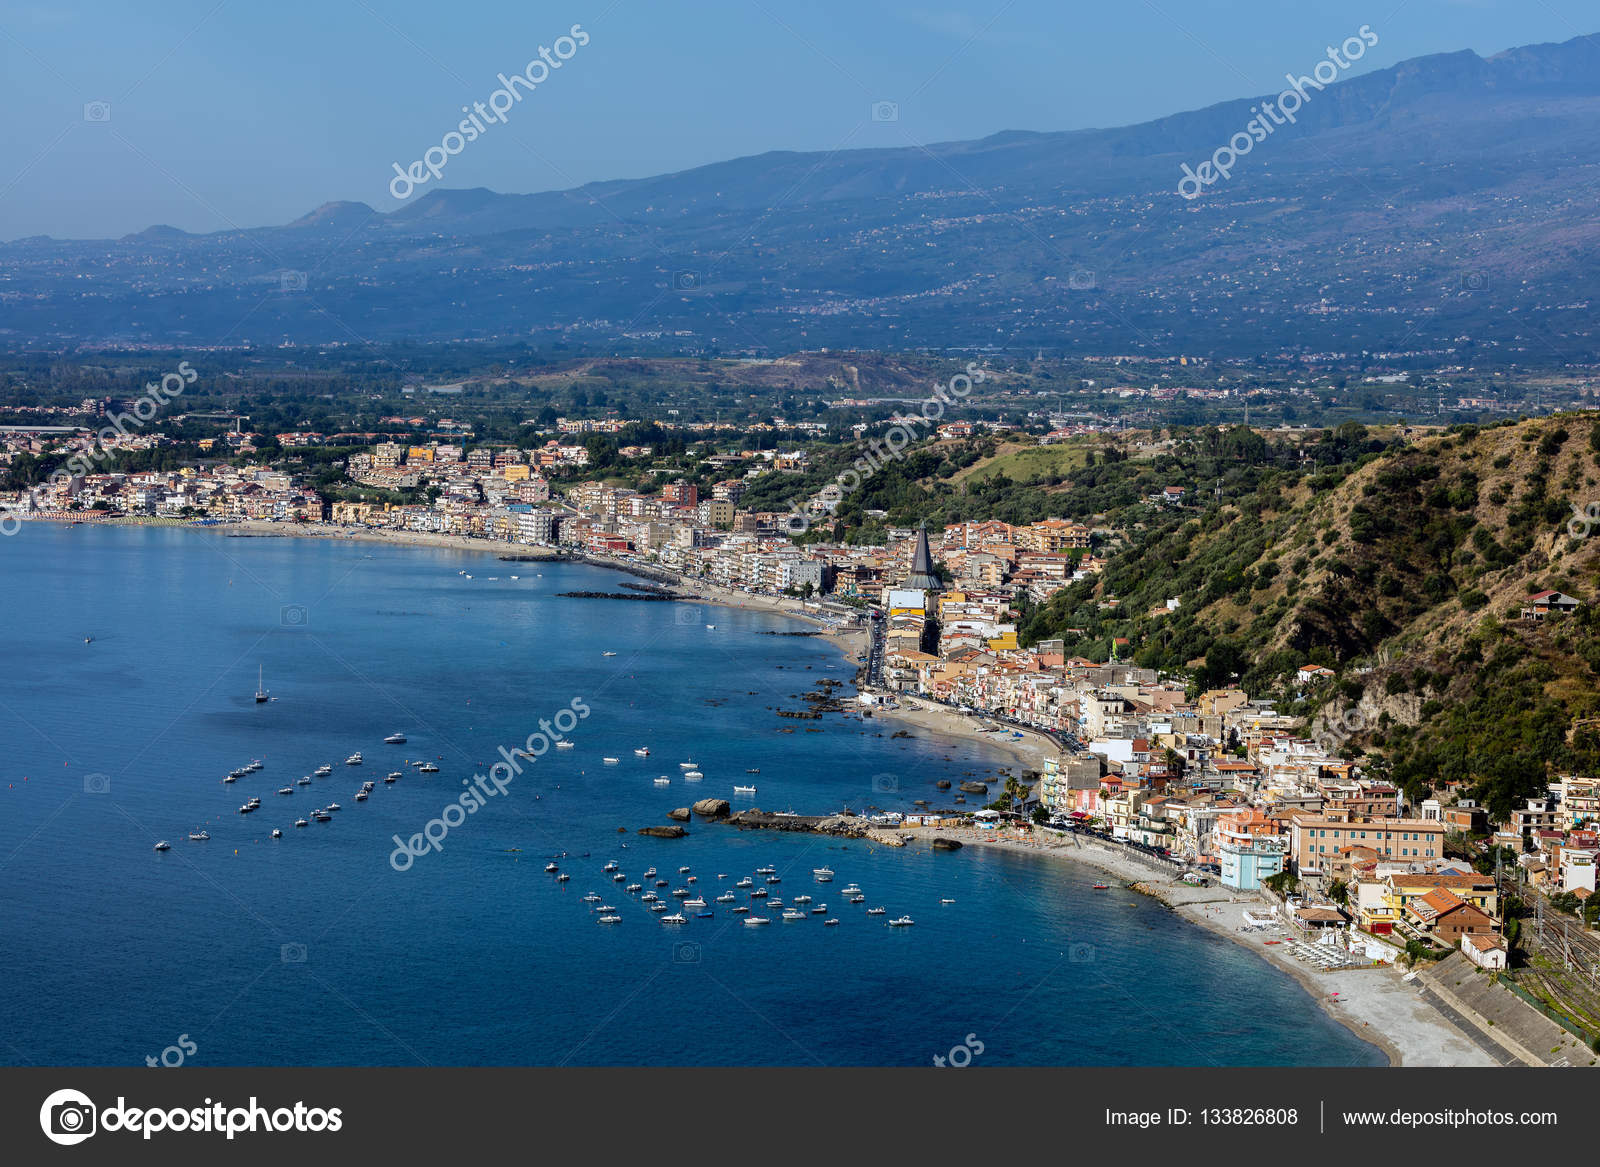 A giardini naxos in sicilia italia u2014 foto stock © vkorost #133826808